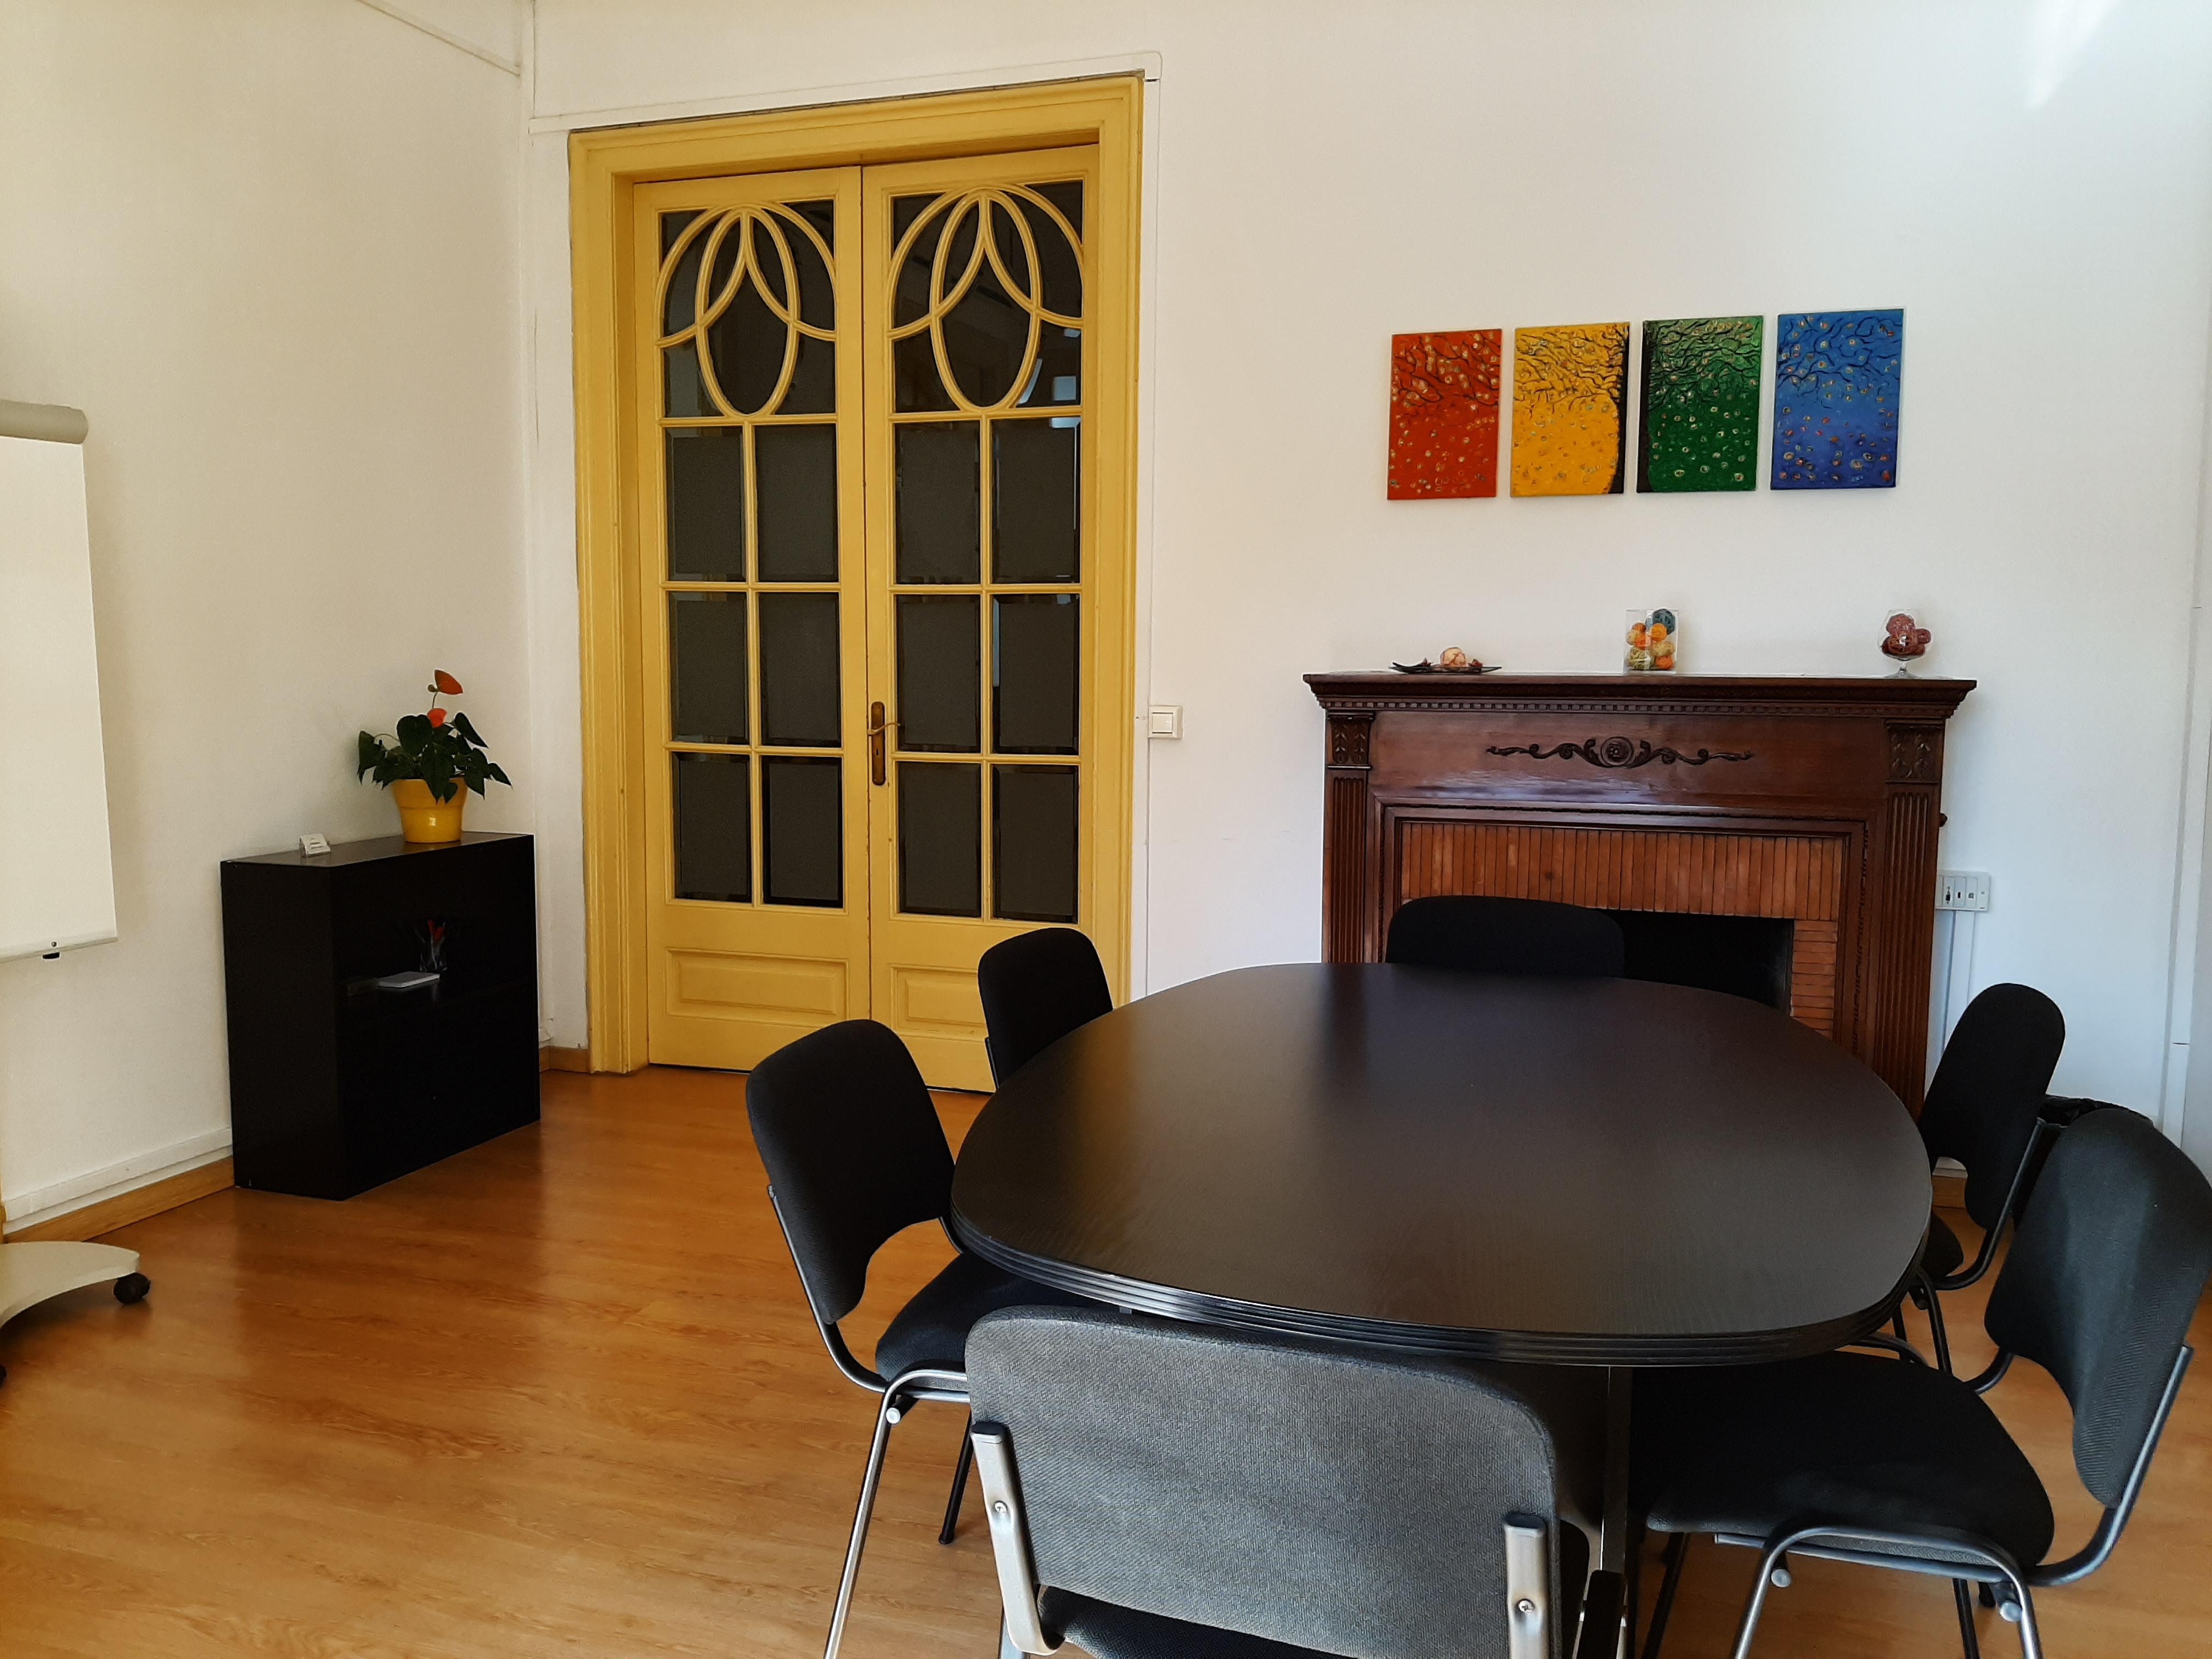 sala de reunions